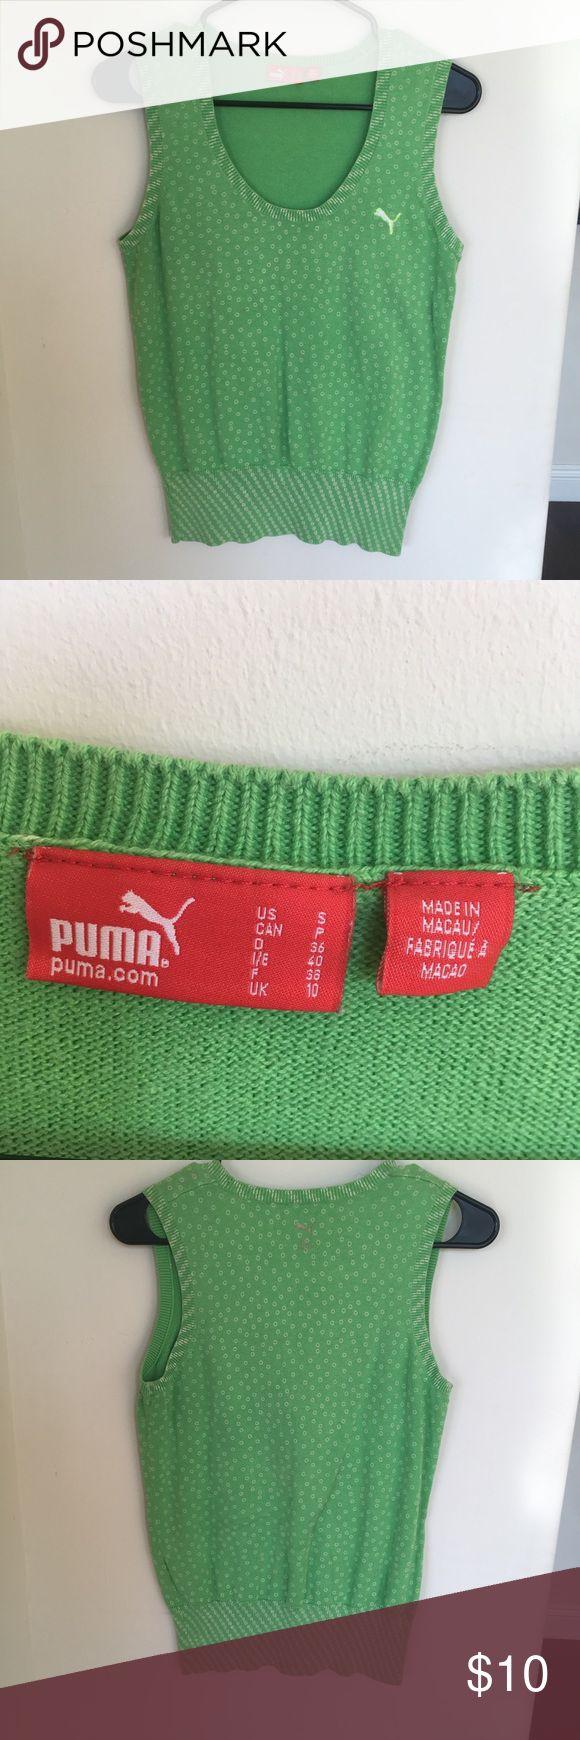 Puma golf sweater (s) Puma golf sweater (s) lightly worn.  Great condition Puma Sweaters